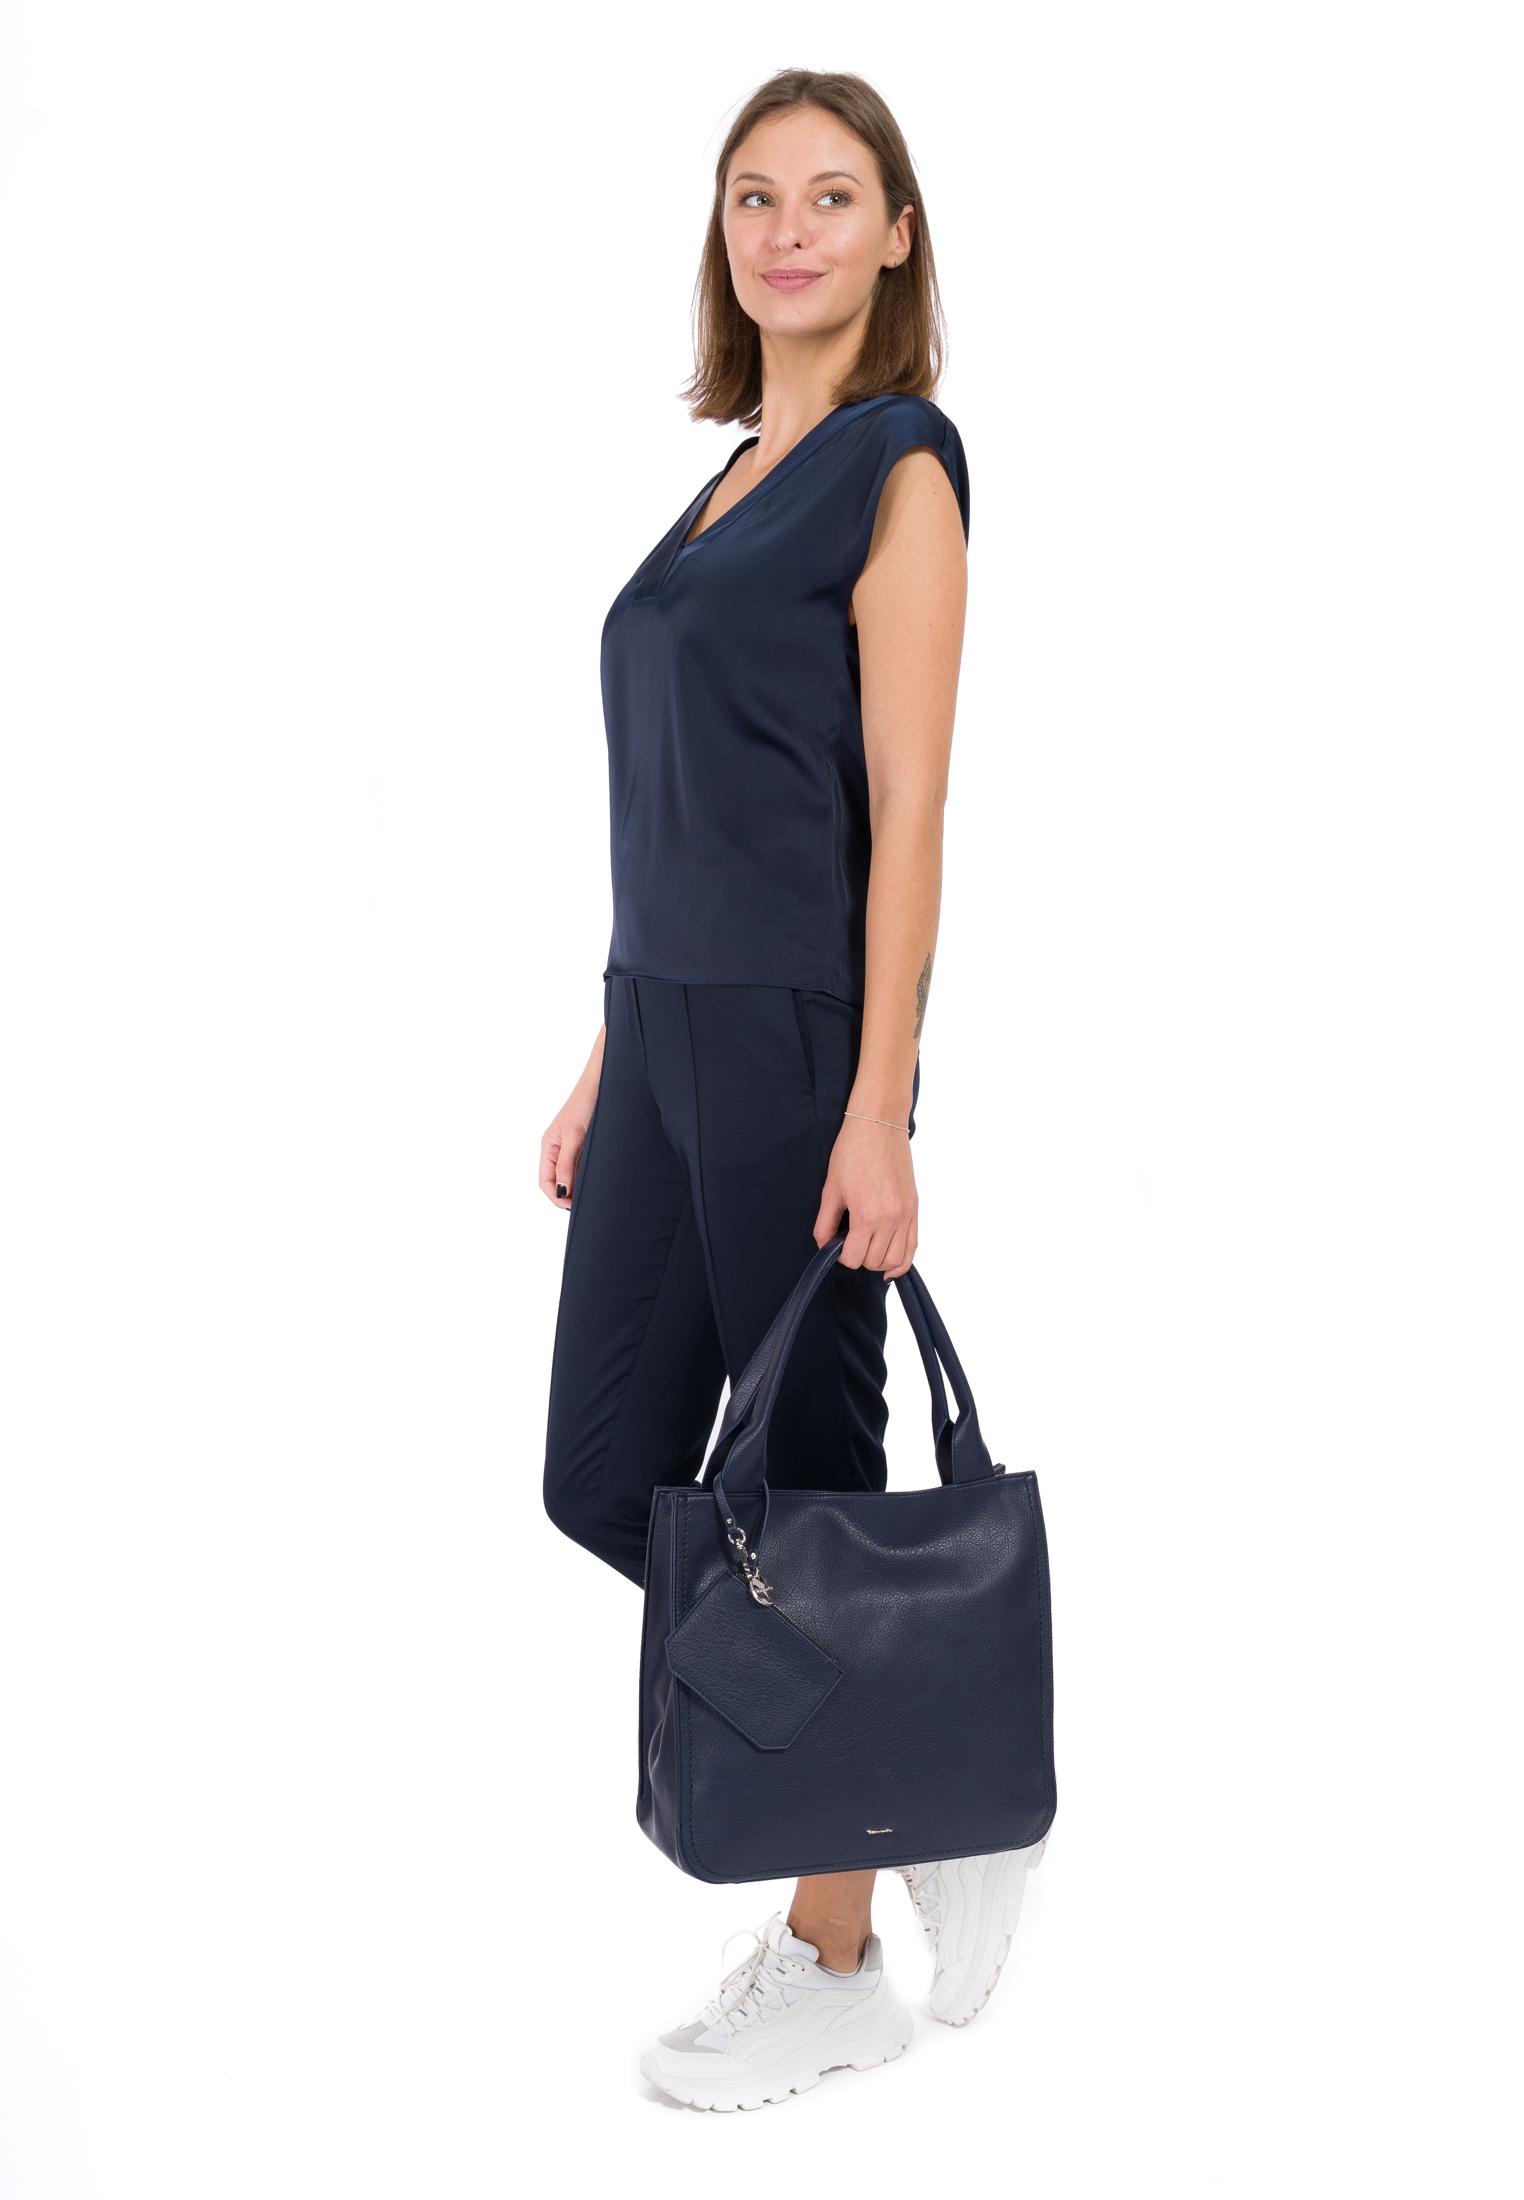 Shopper Alisha groß